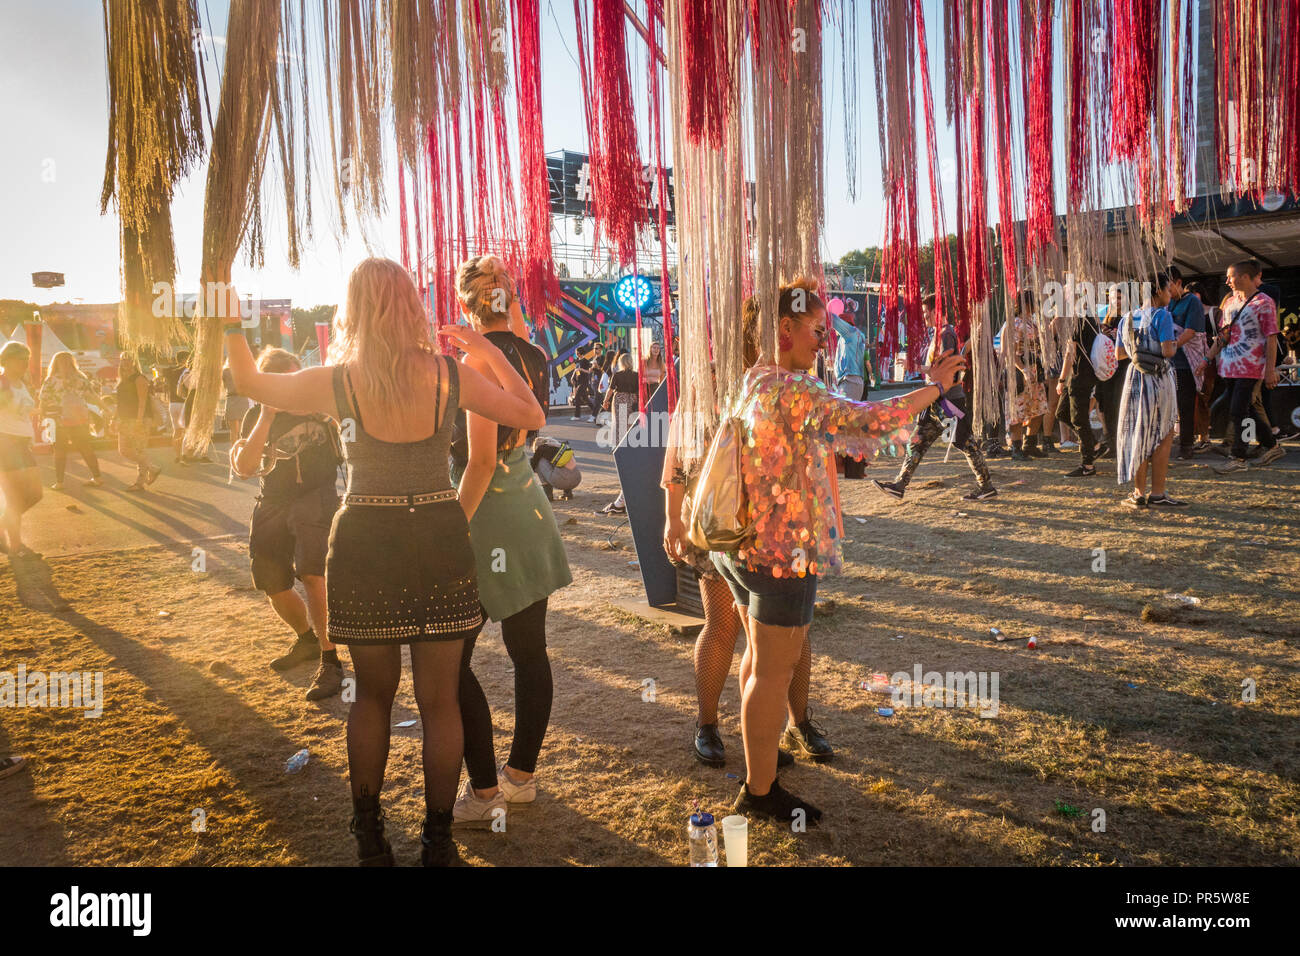 Lollapalooza music festival 2018 Berlin - Stock Image